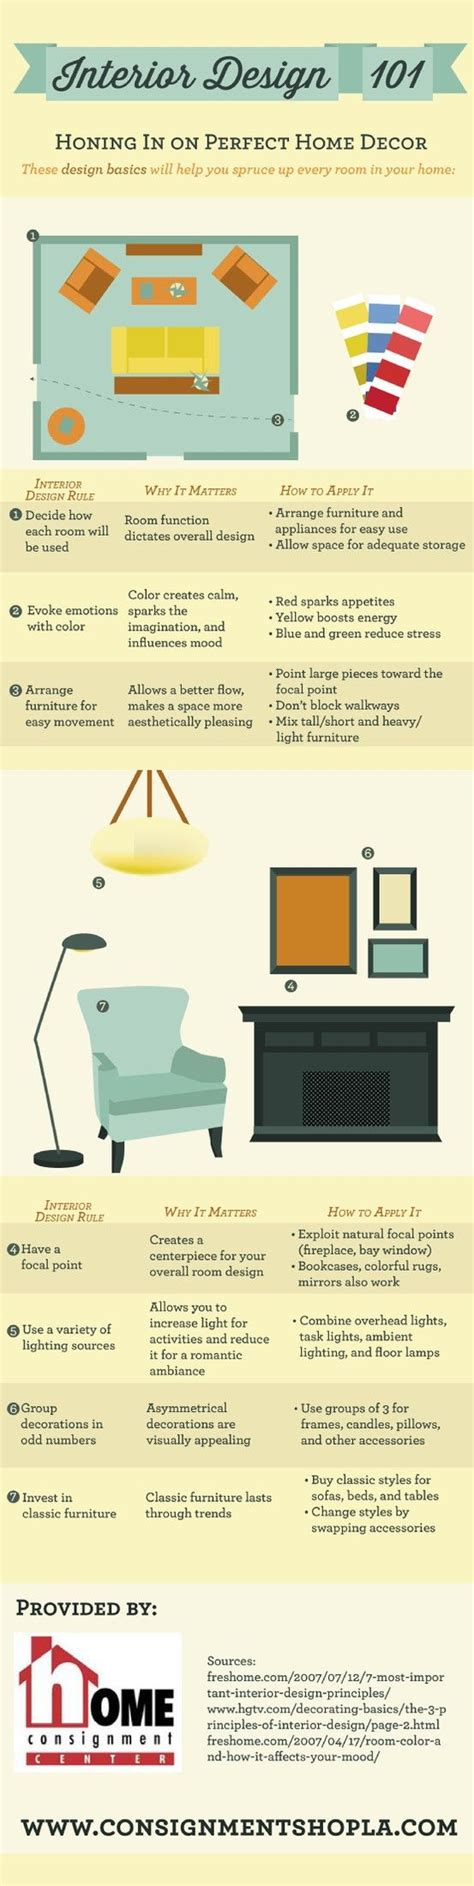 learn interior design basics best 25 remind 101 ideas on pinterest curriculum night